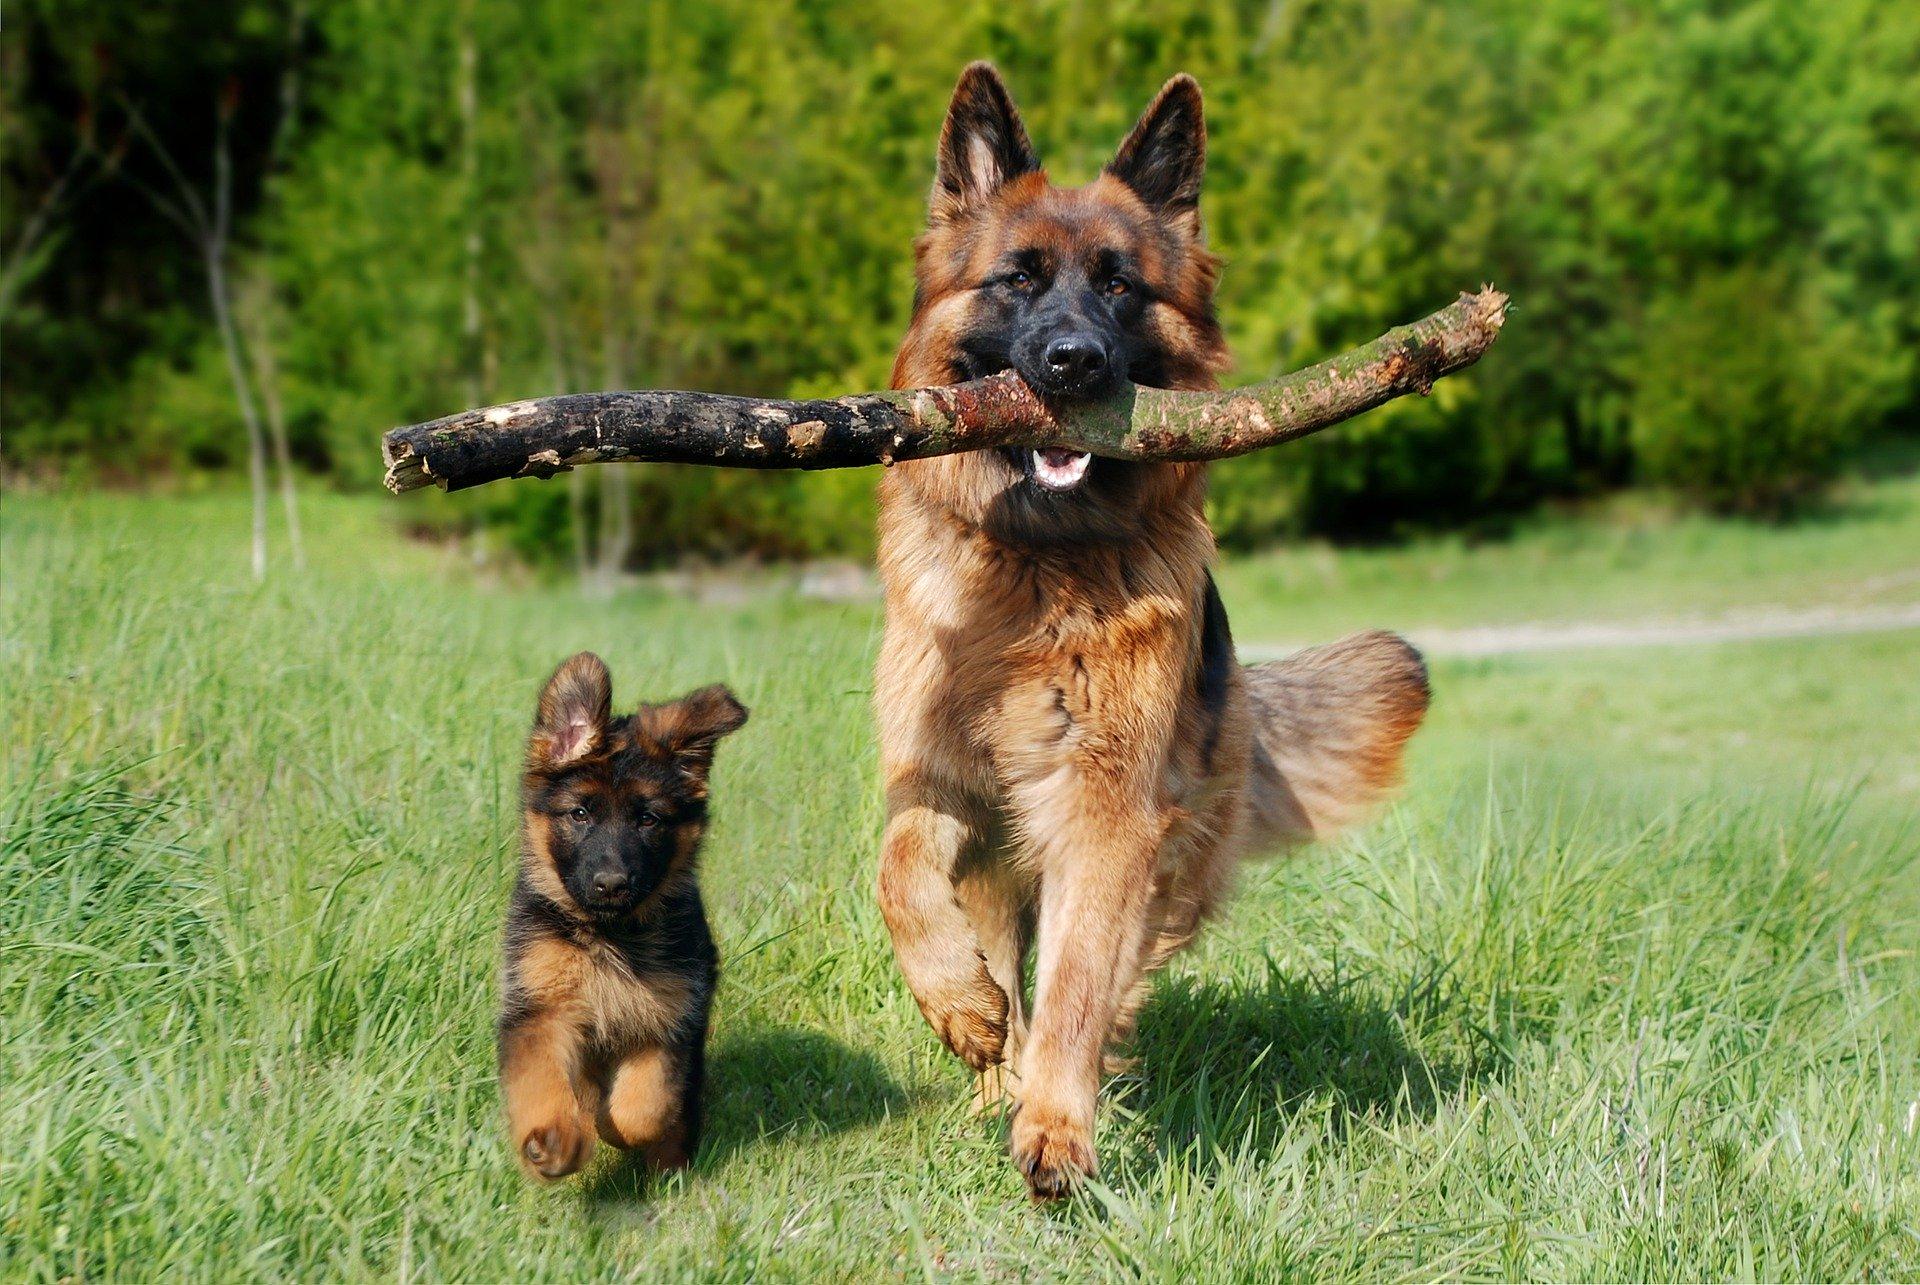 Cât timp crește un cioban german?